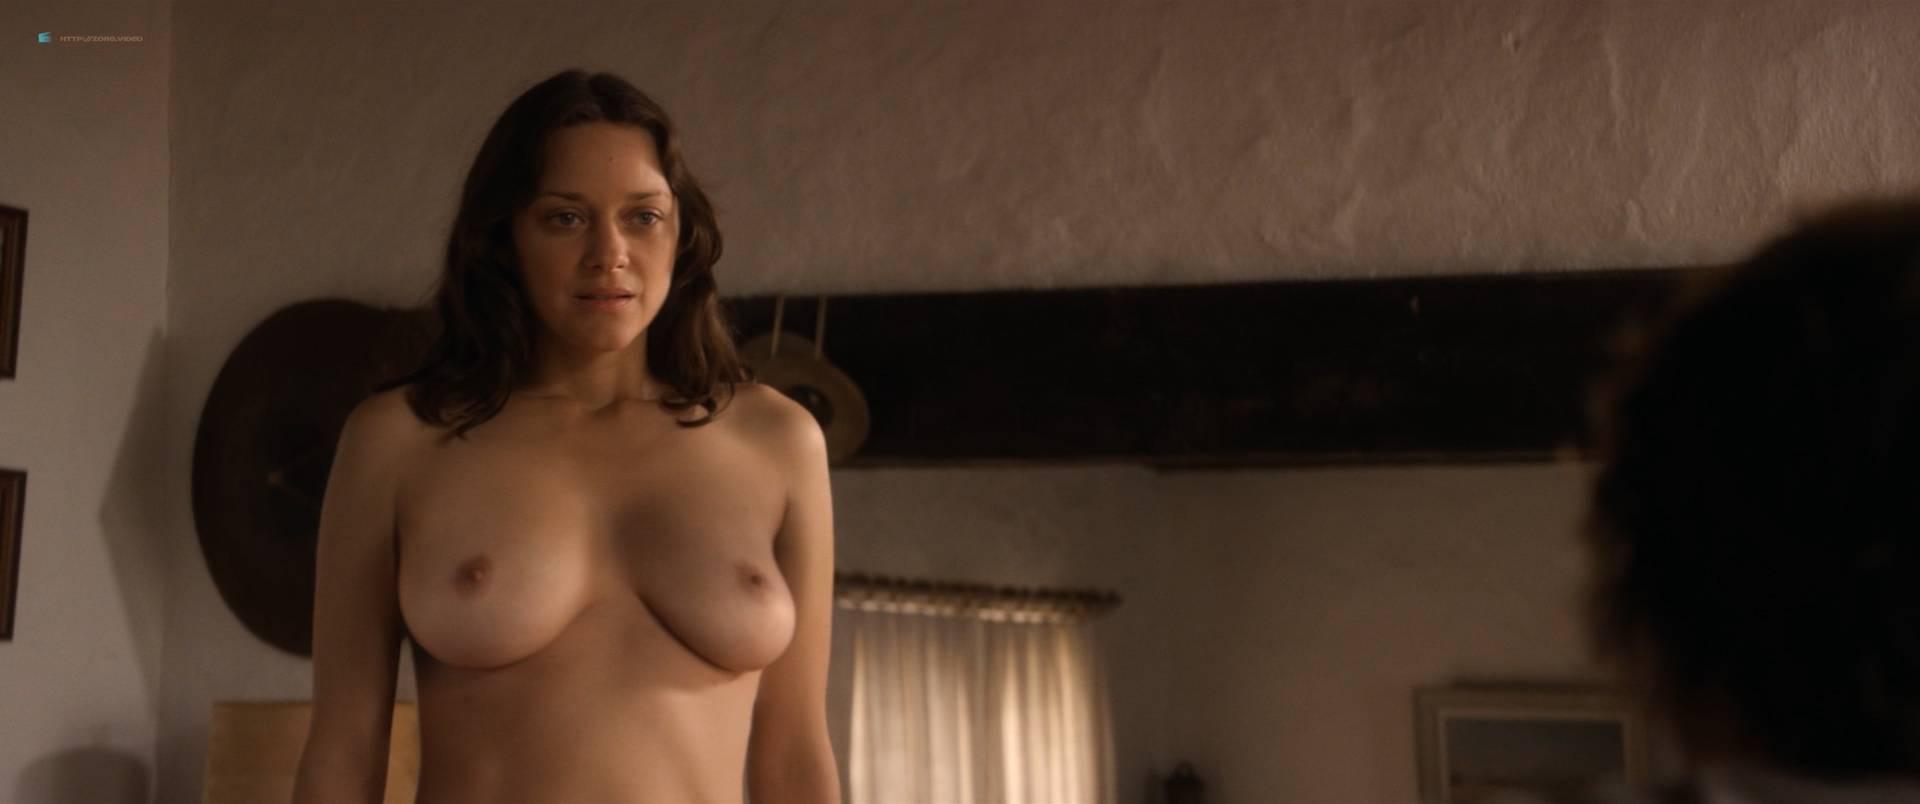 Marion-Cotillard-nude-full-frontal-Alba-Rohrwacher-nude-nipple-Les-fantomes-d_Ismael-FR-2017-HD-1080p-BluRay-010.jpg